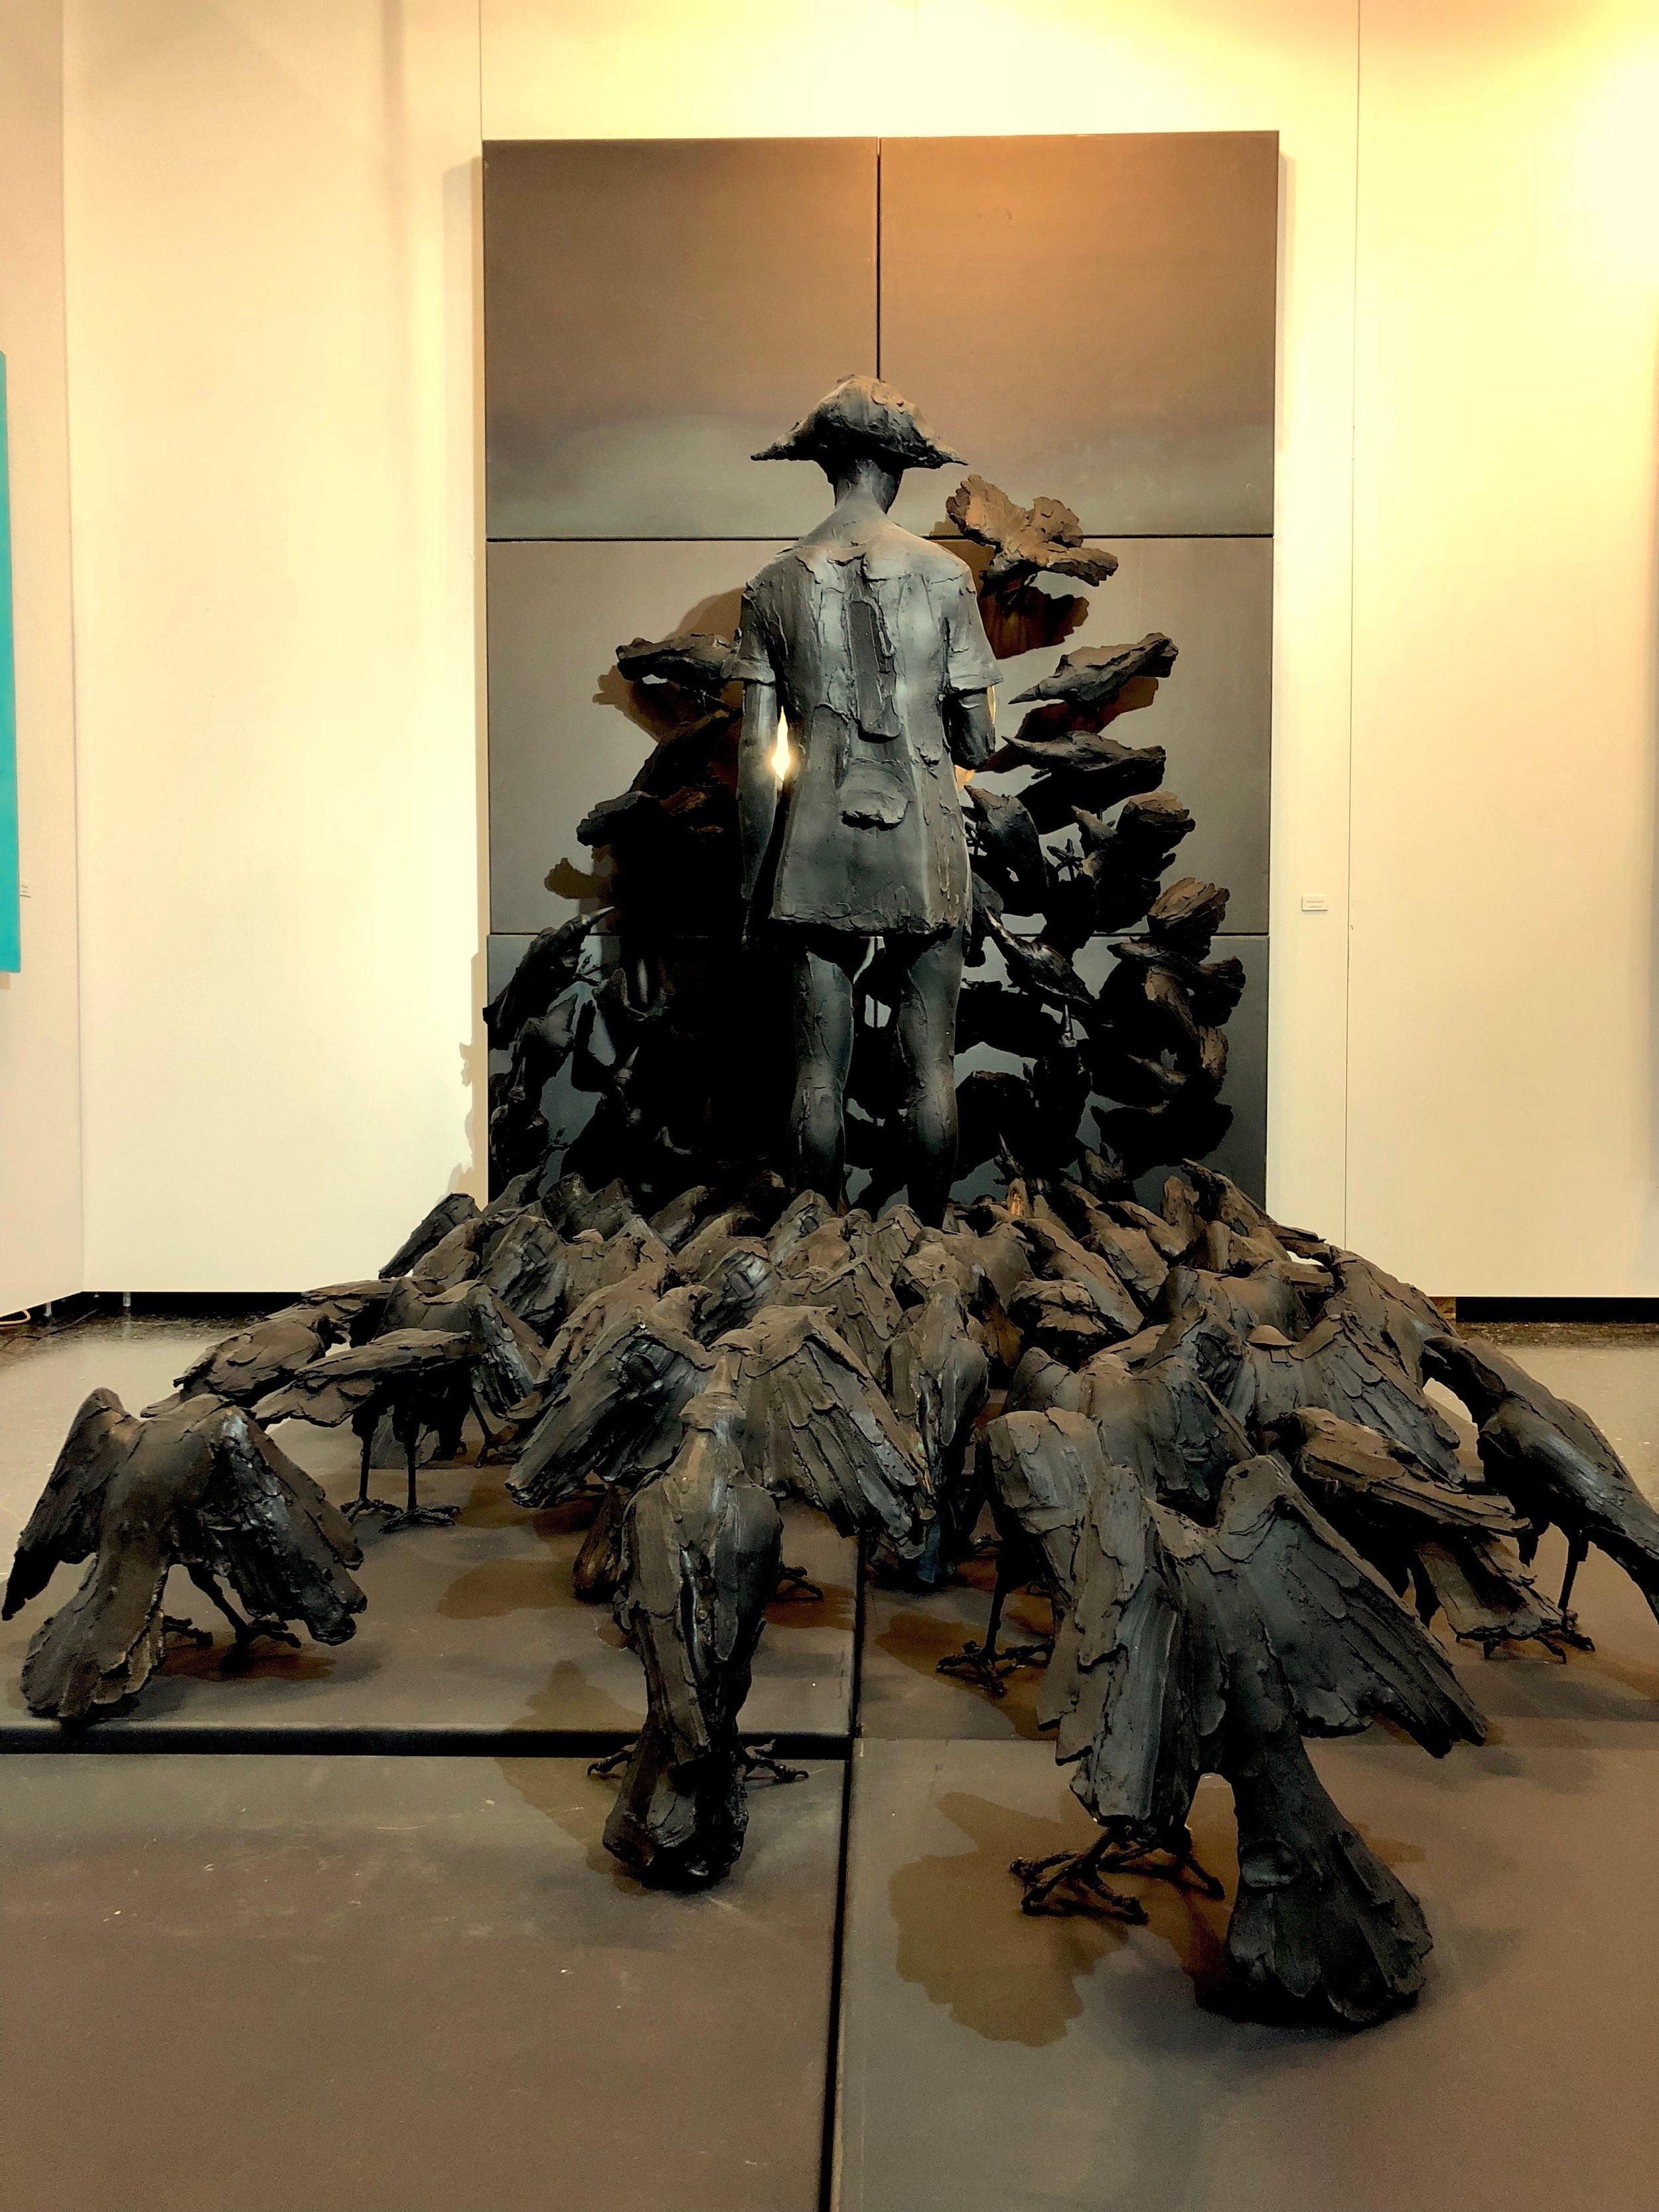 The fabulous work of Mahmut Aydin at PG Art Gallery